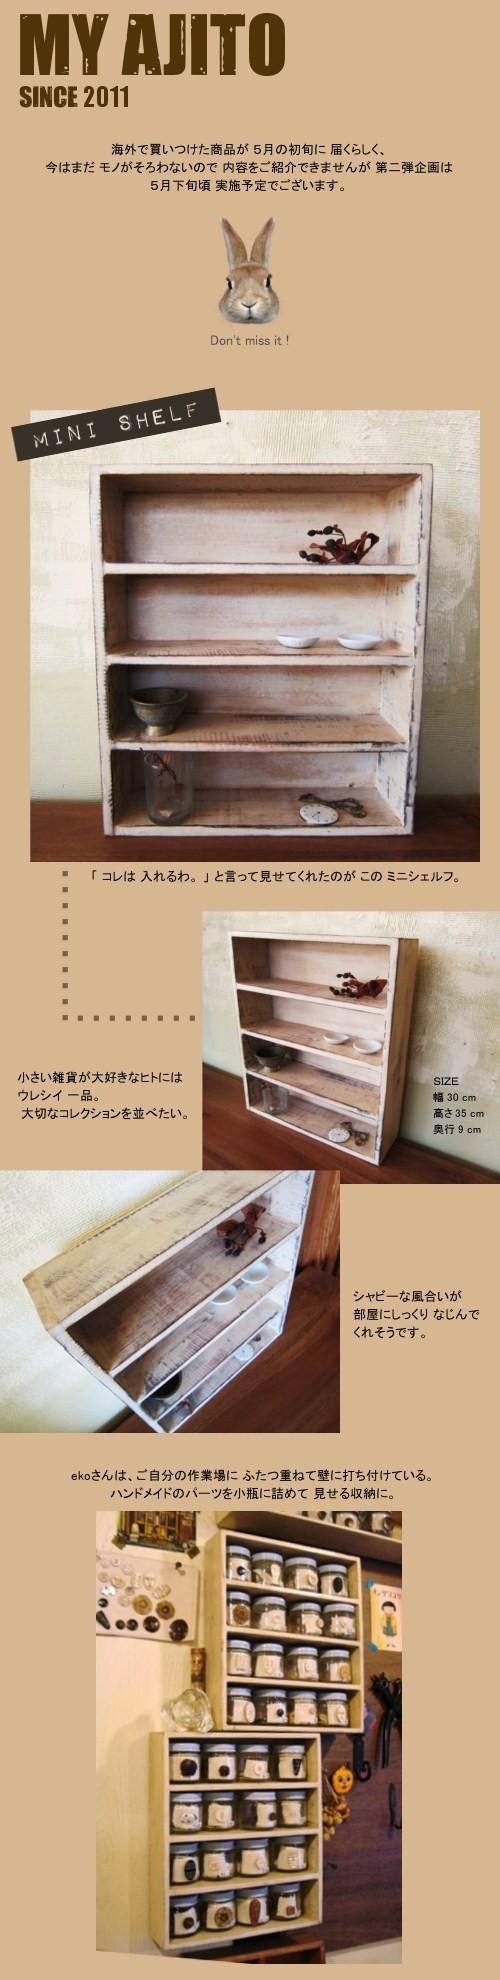 baki_2nd_3.jpg